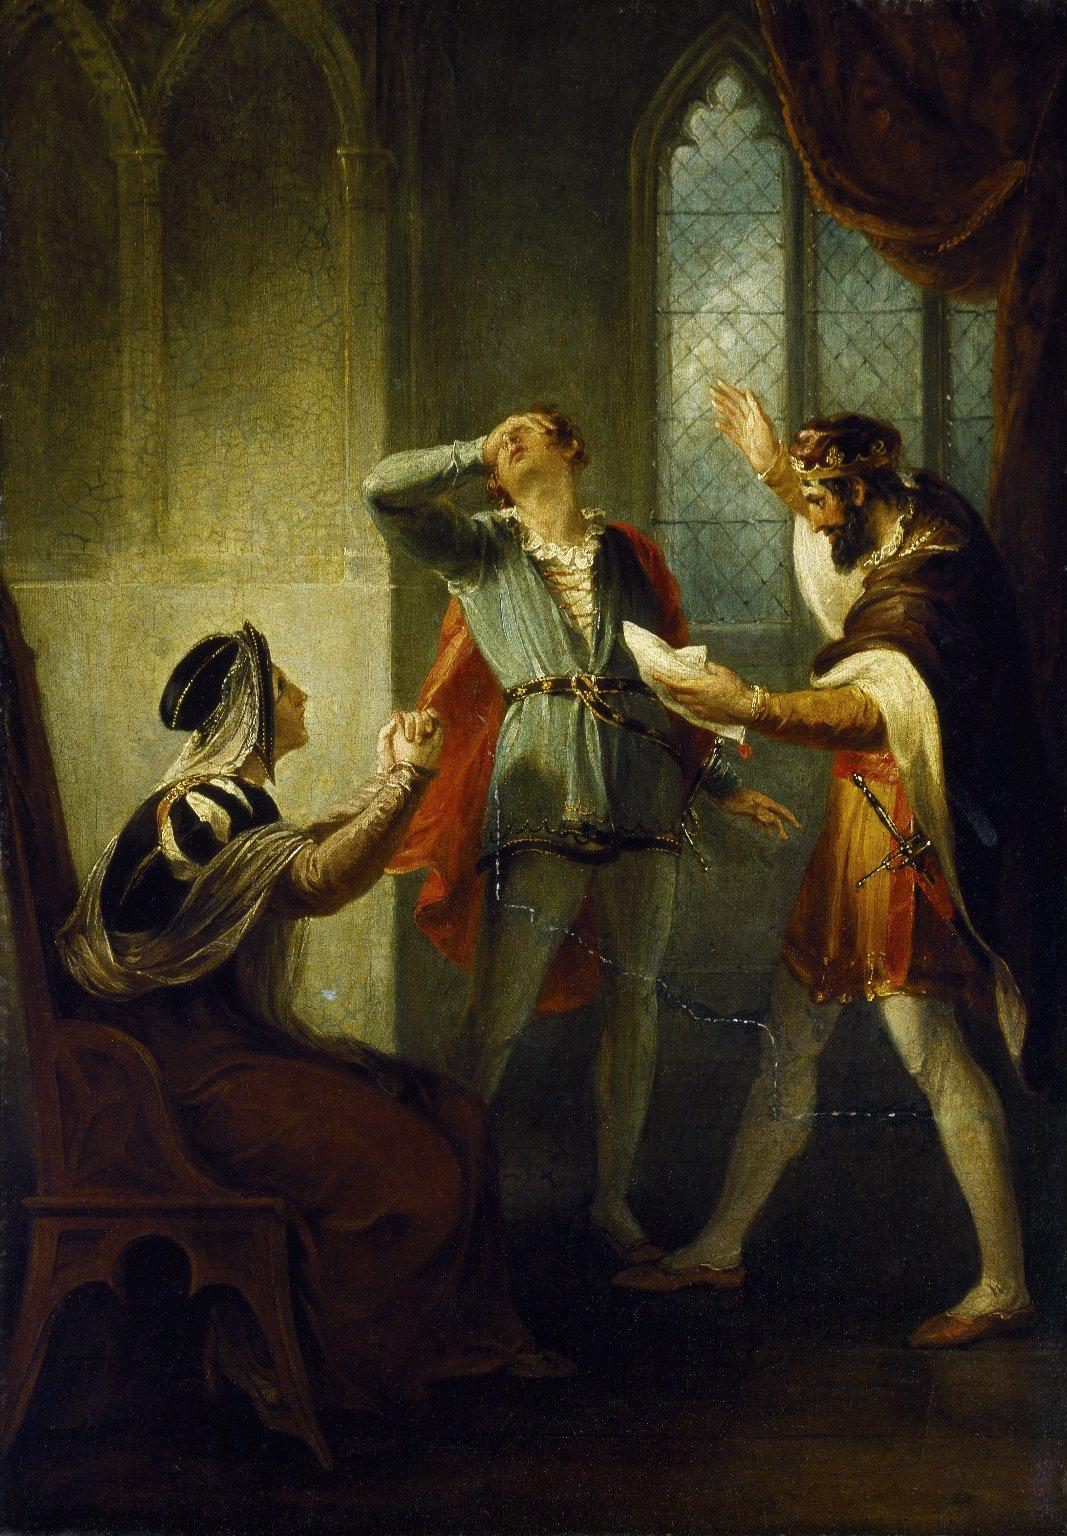 The Duke of York discovering his son Aumerle's treachery